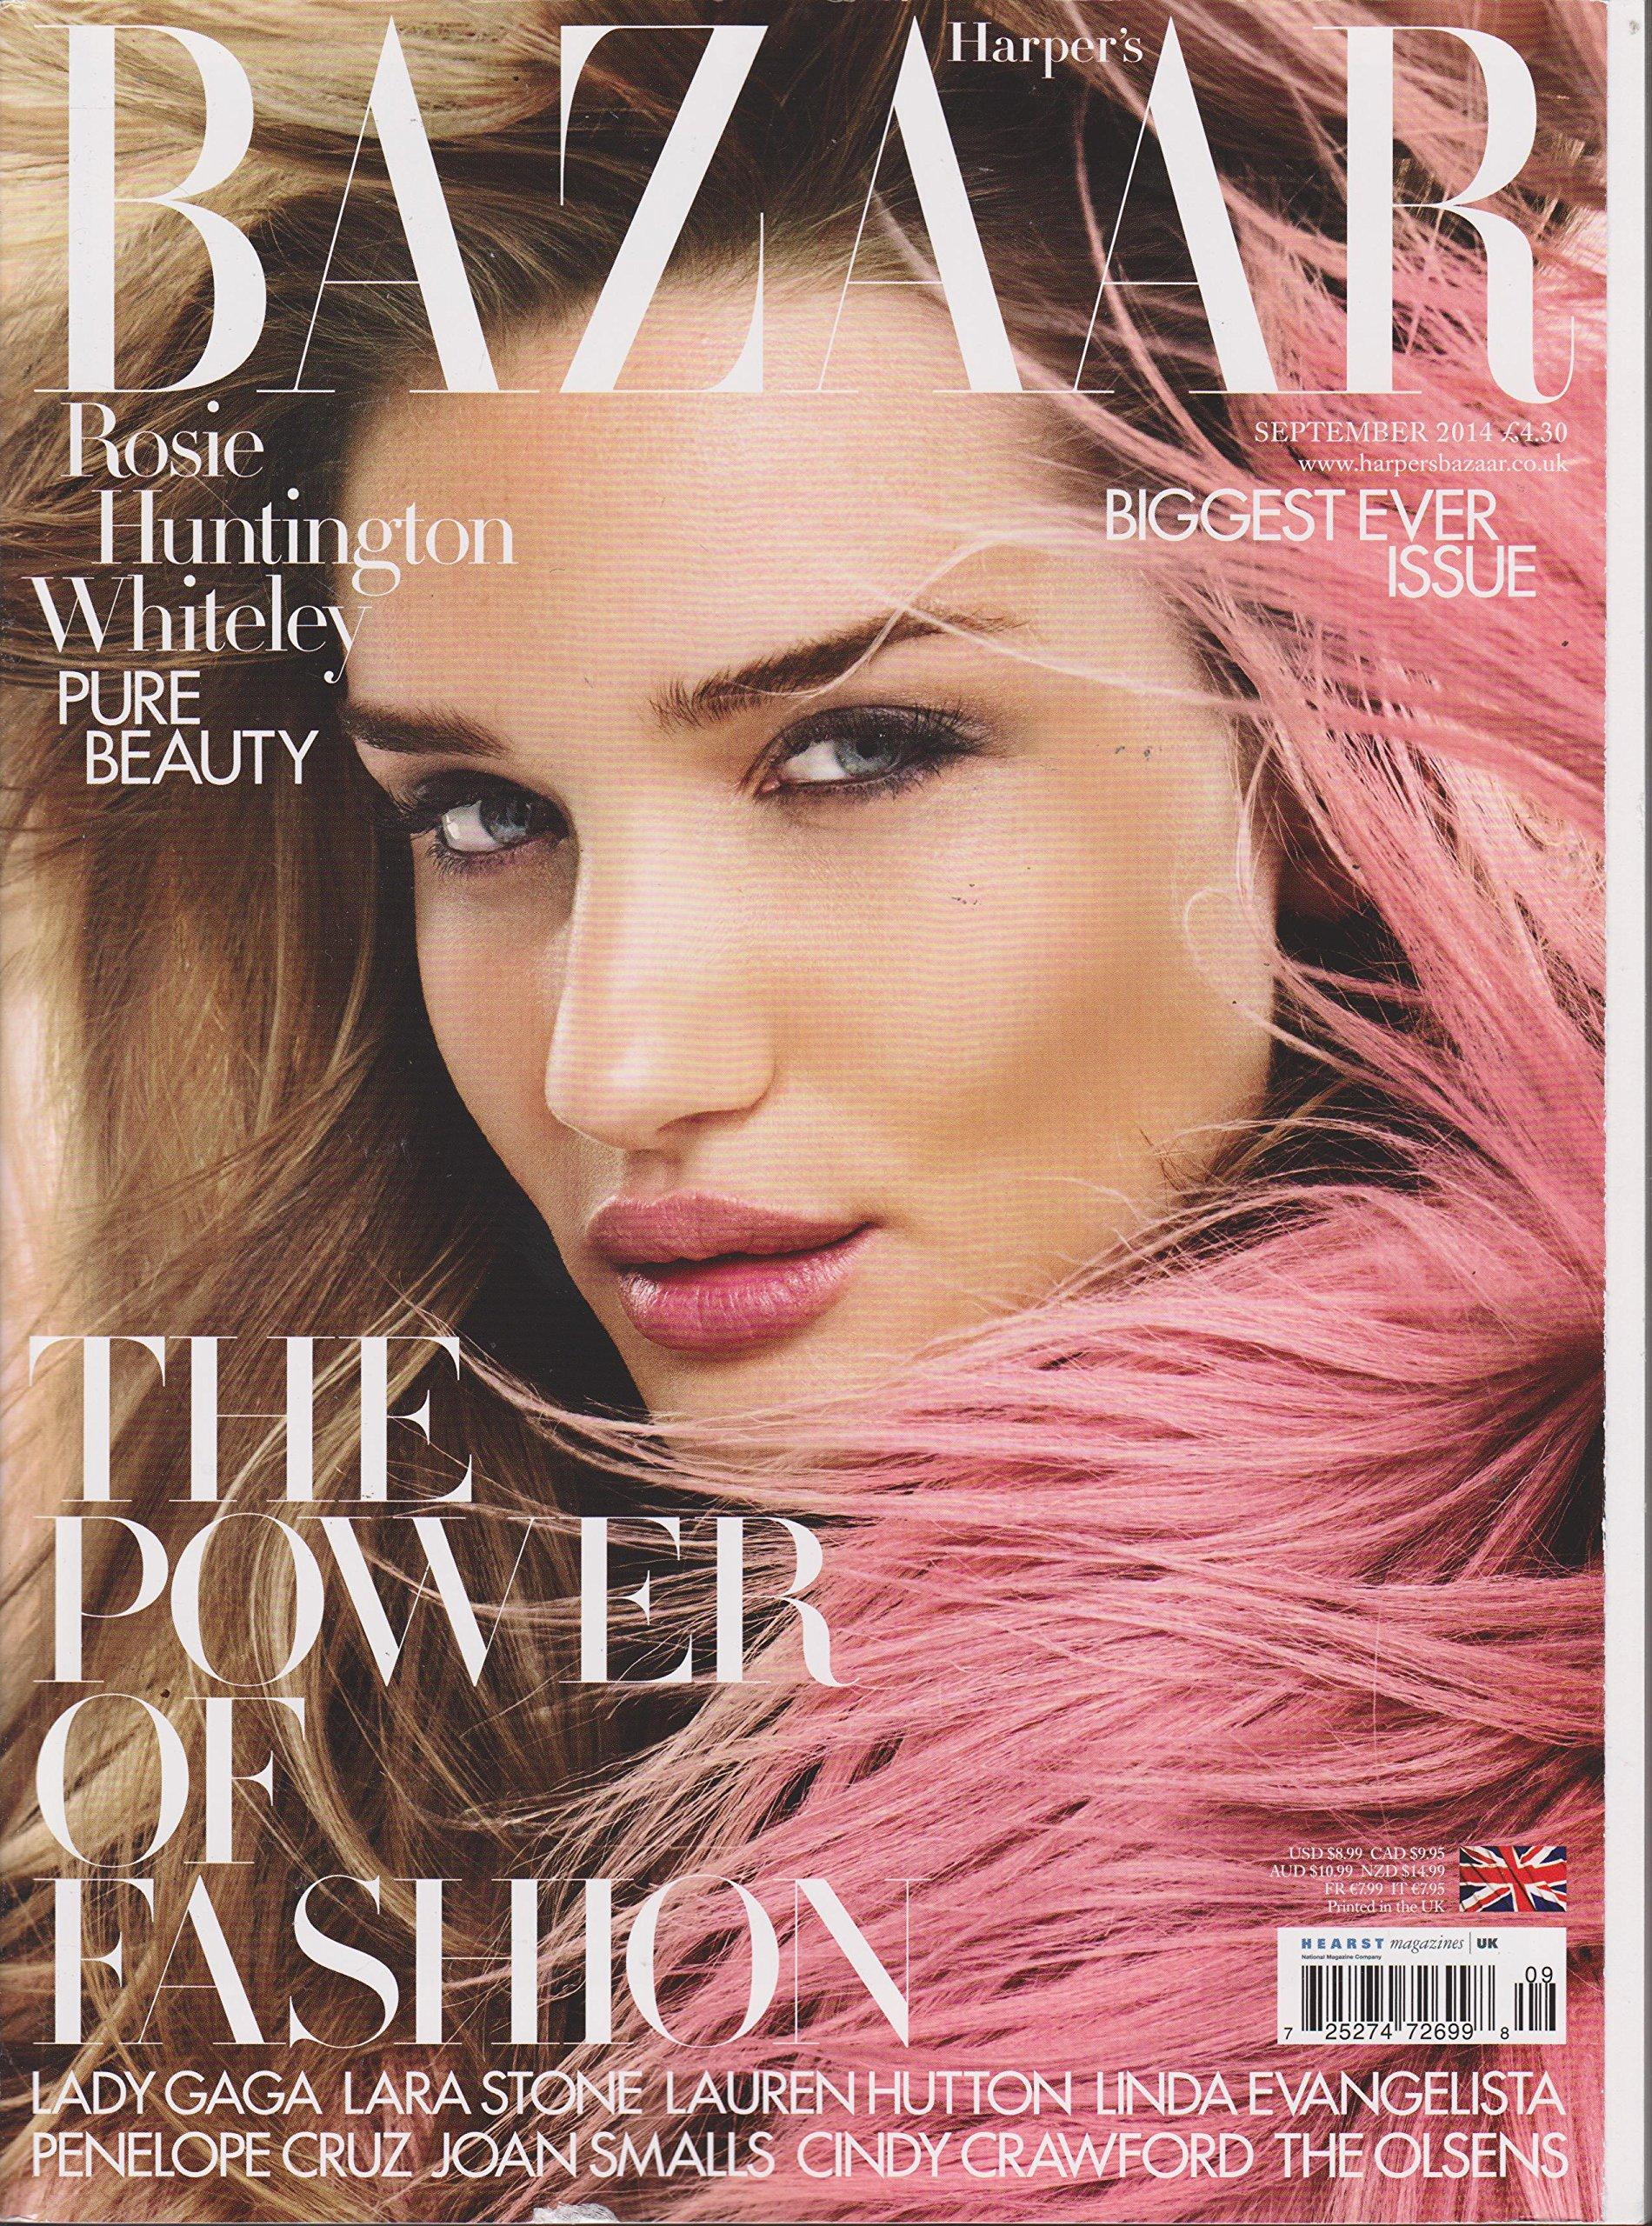 Harpers Bazaar Magazine - September 2014 Lady GaGa Cover: Amazon.es: Harpers Bazaar Magazine: Libros